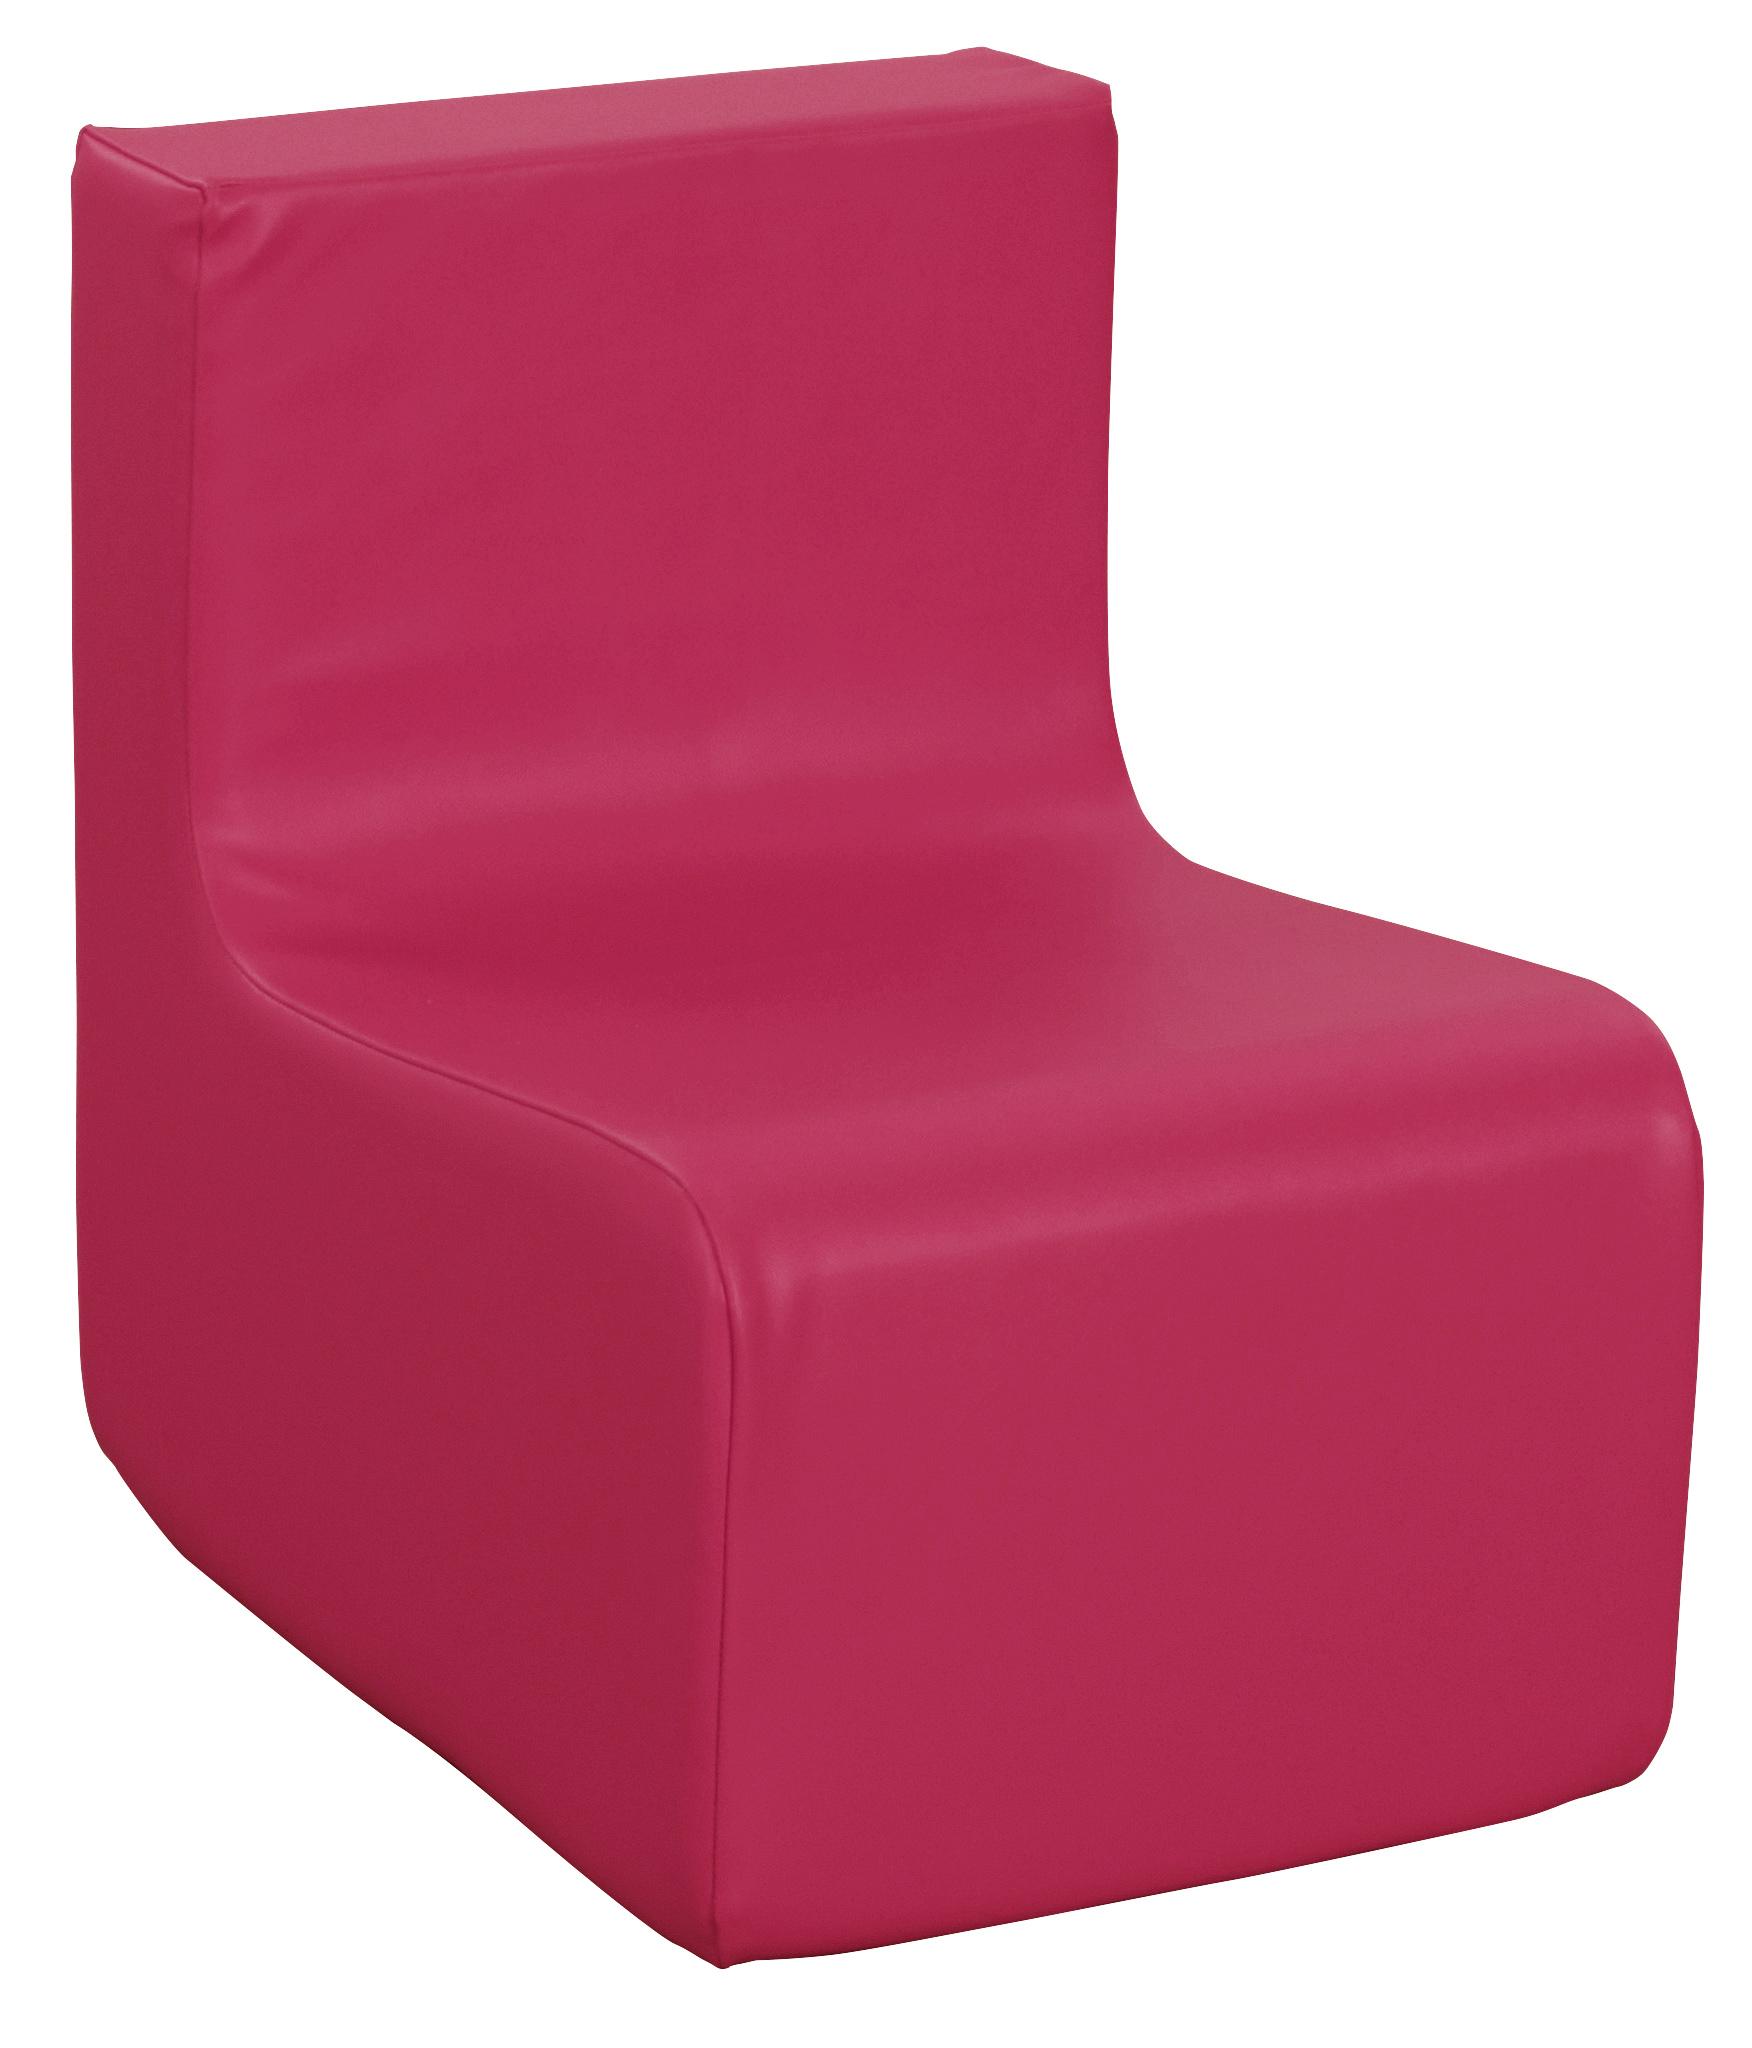 chauffeuse lutins simire. Black Bedroom Furniture Sets. Home Design Ideas